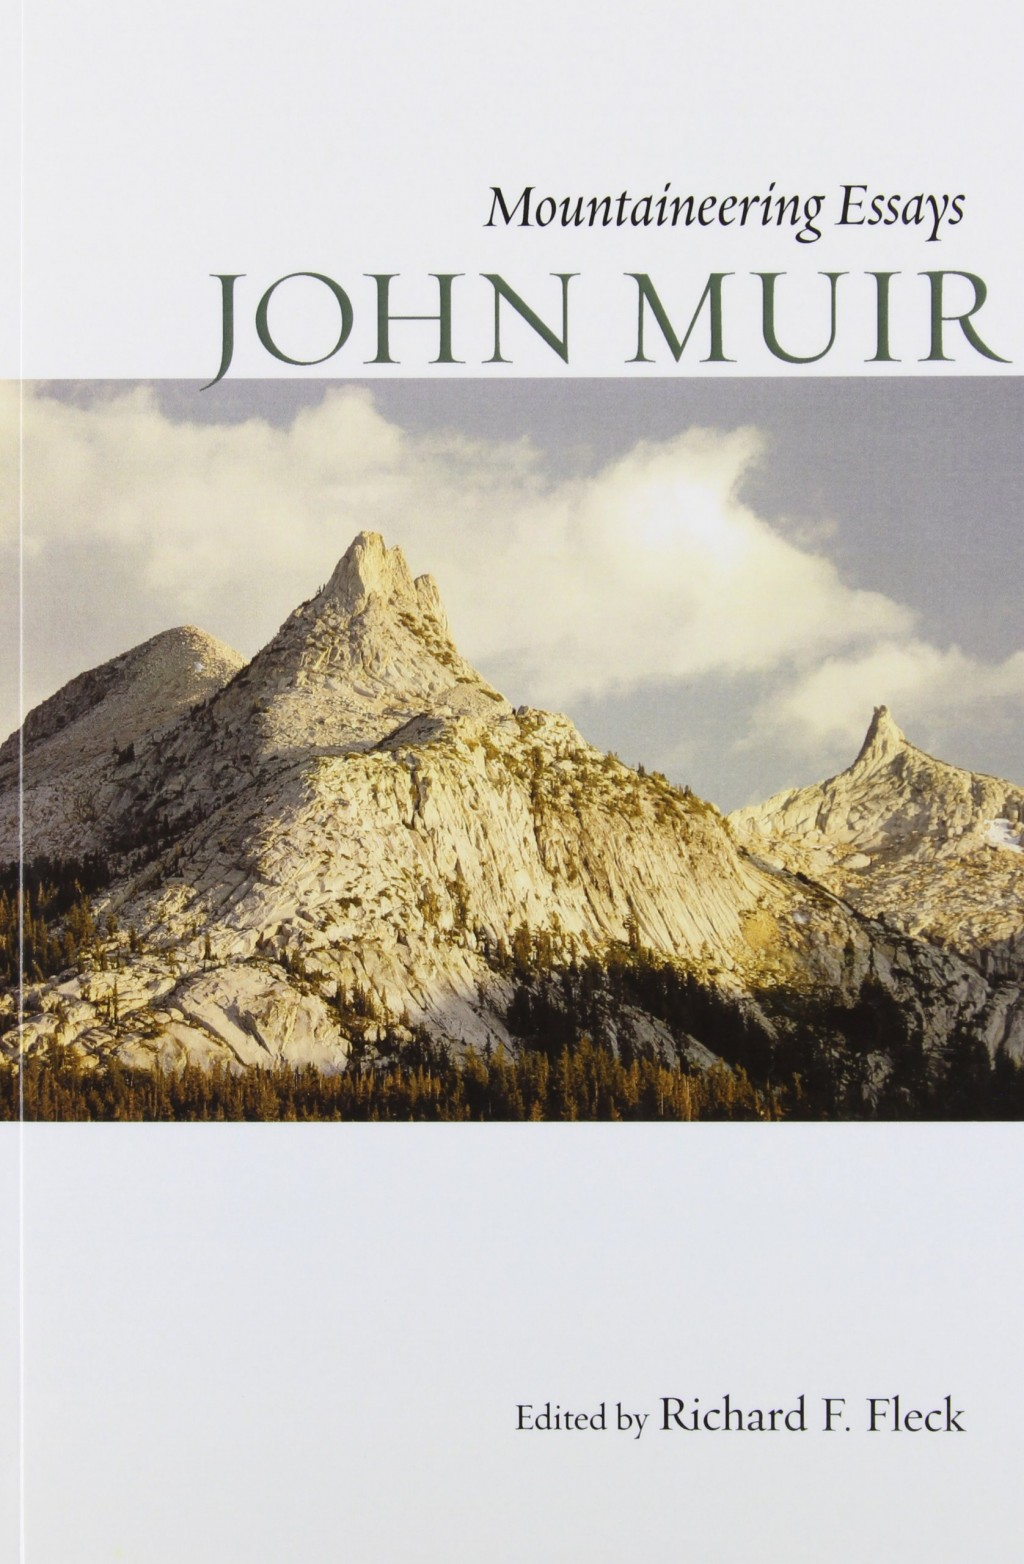 018 817oif2bioml John Muir Wilderness Essays Essay Best Pdf Review Large